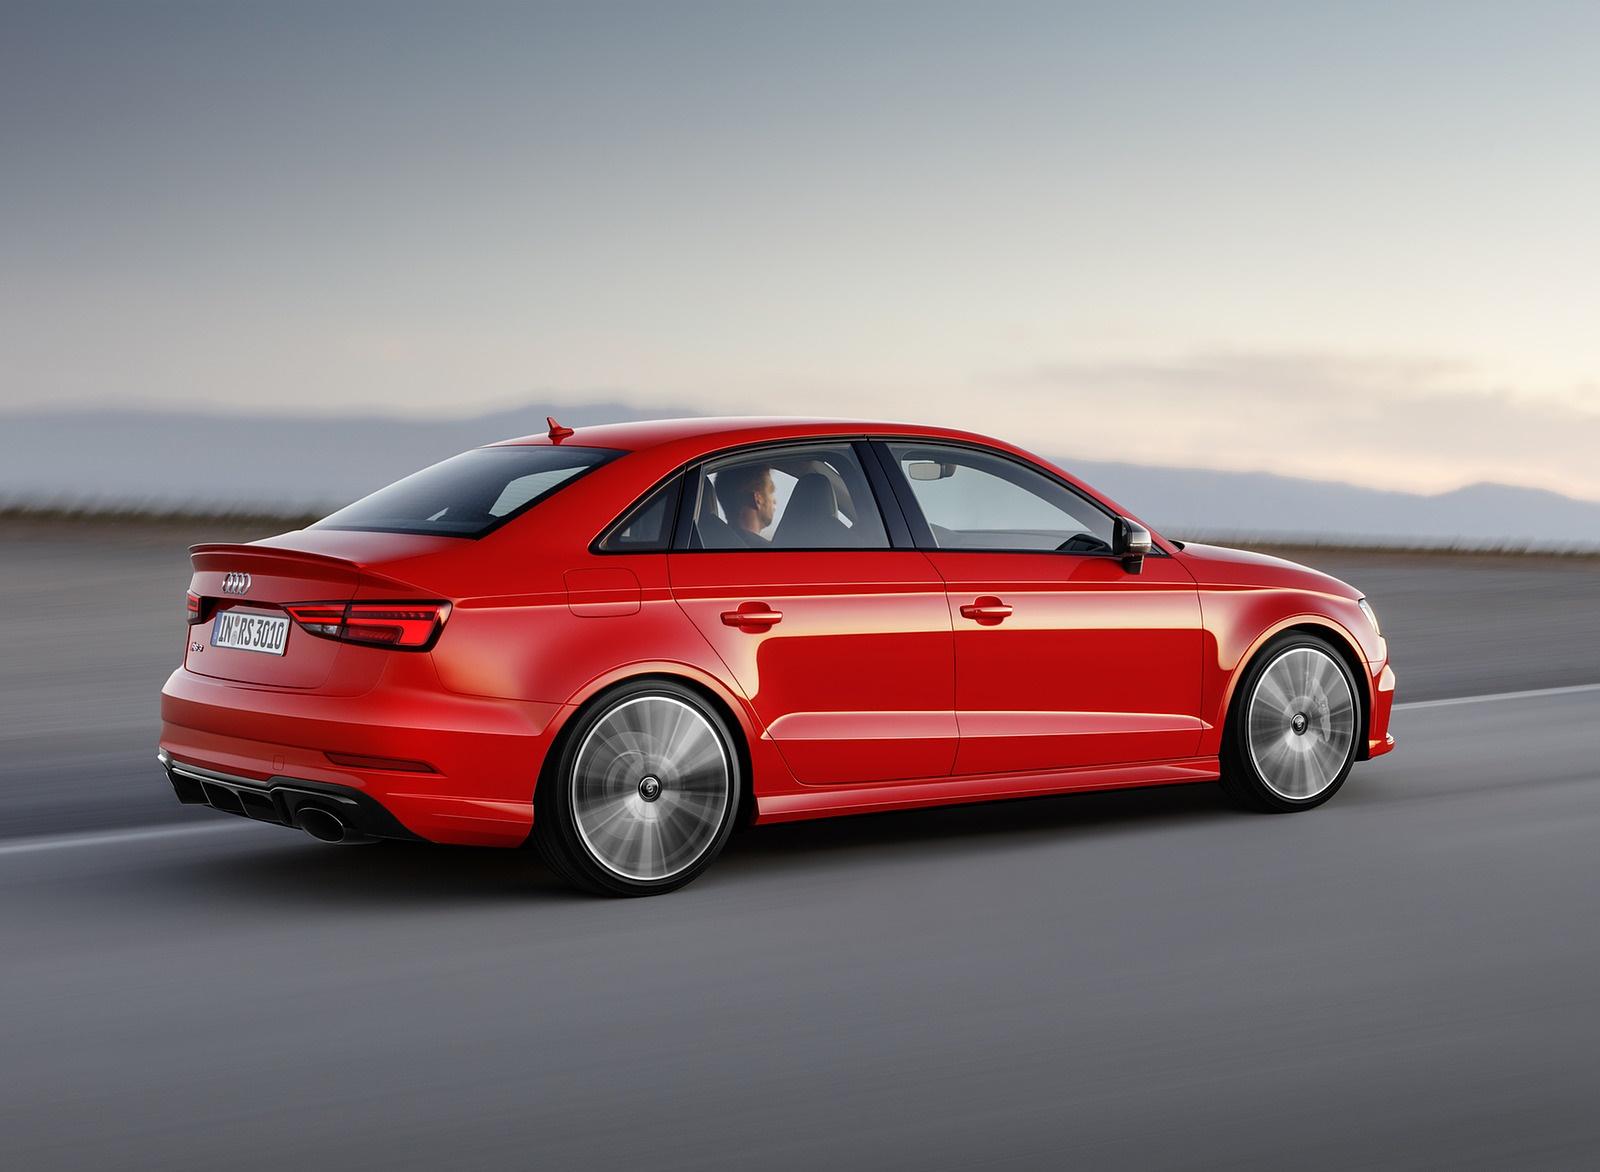 2018 Audi Rs3 Sedan Color Catalunya Red Rear Three Quarter Wallpapers 3 Newcarcars